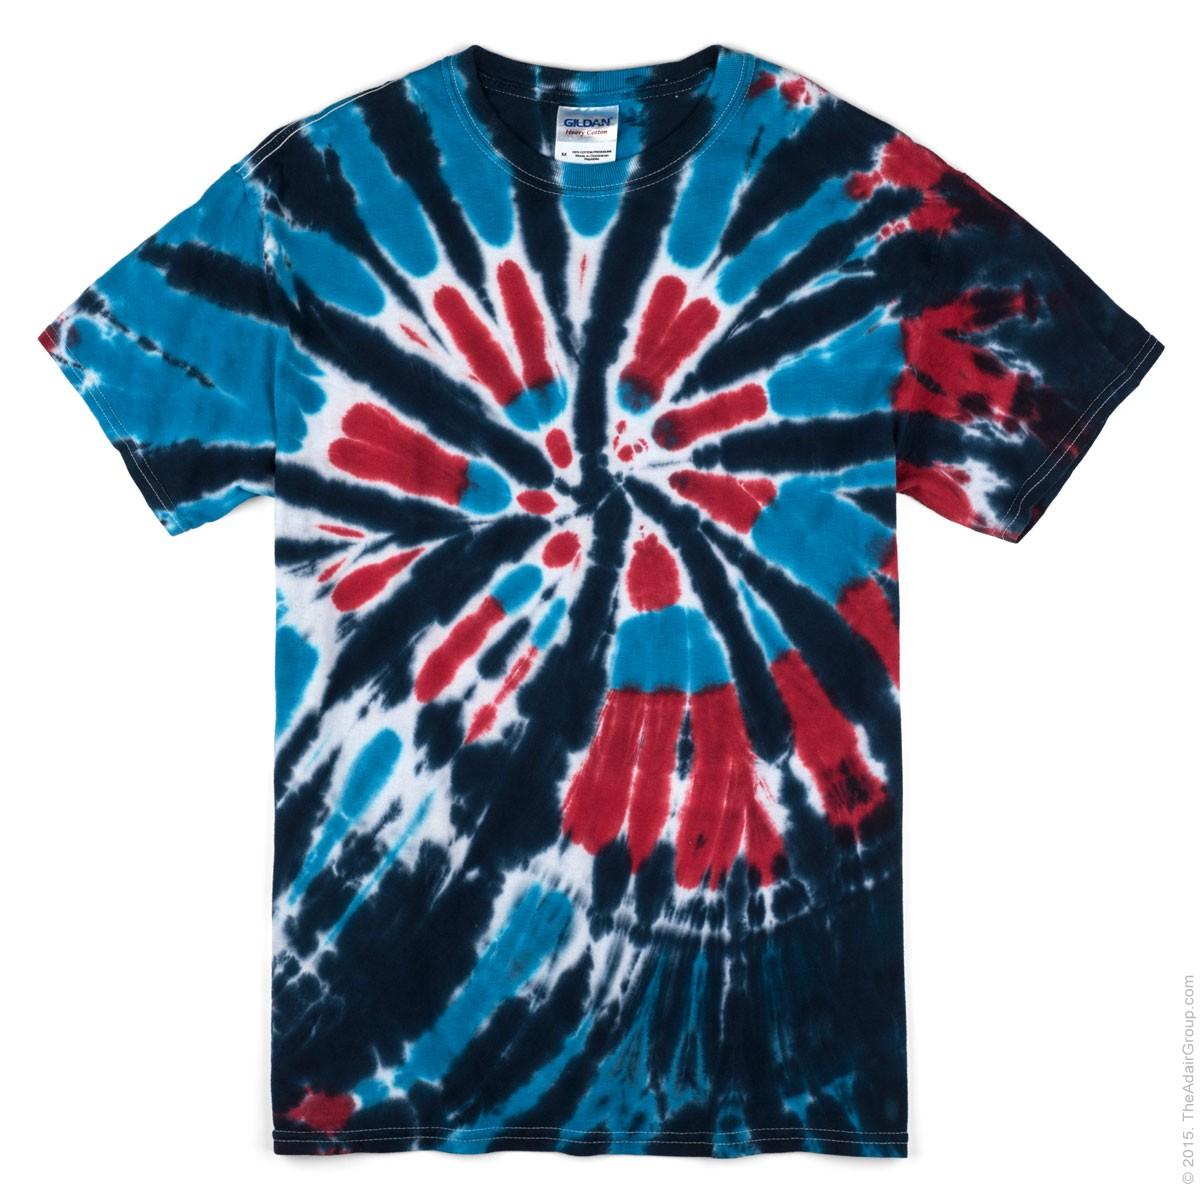 Americana Swirl Adult Tie Dye T-Shirt   The Adair Group